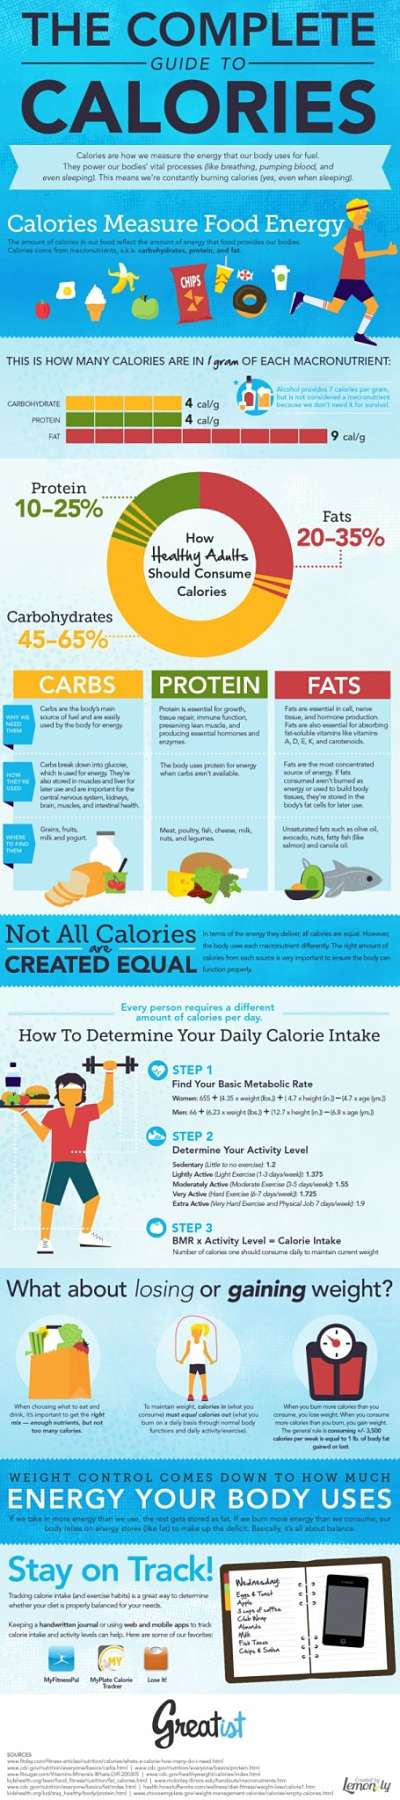 Toca Comer. Guía de las calorías en alimentacion. Marisol Collazos Soto, Rafael Barzanallana